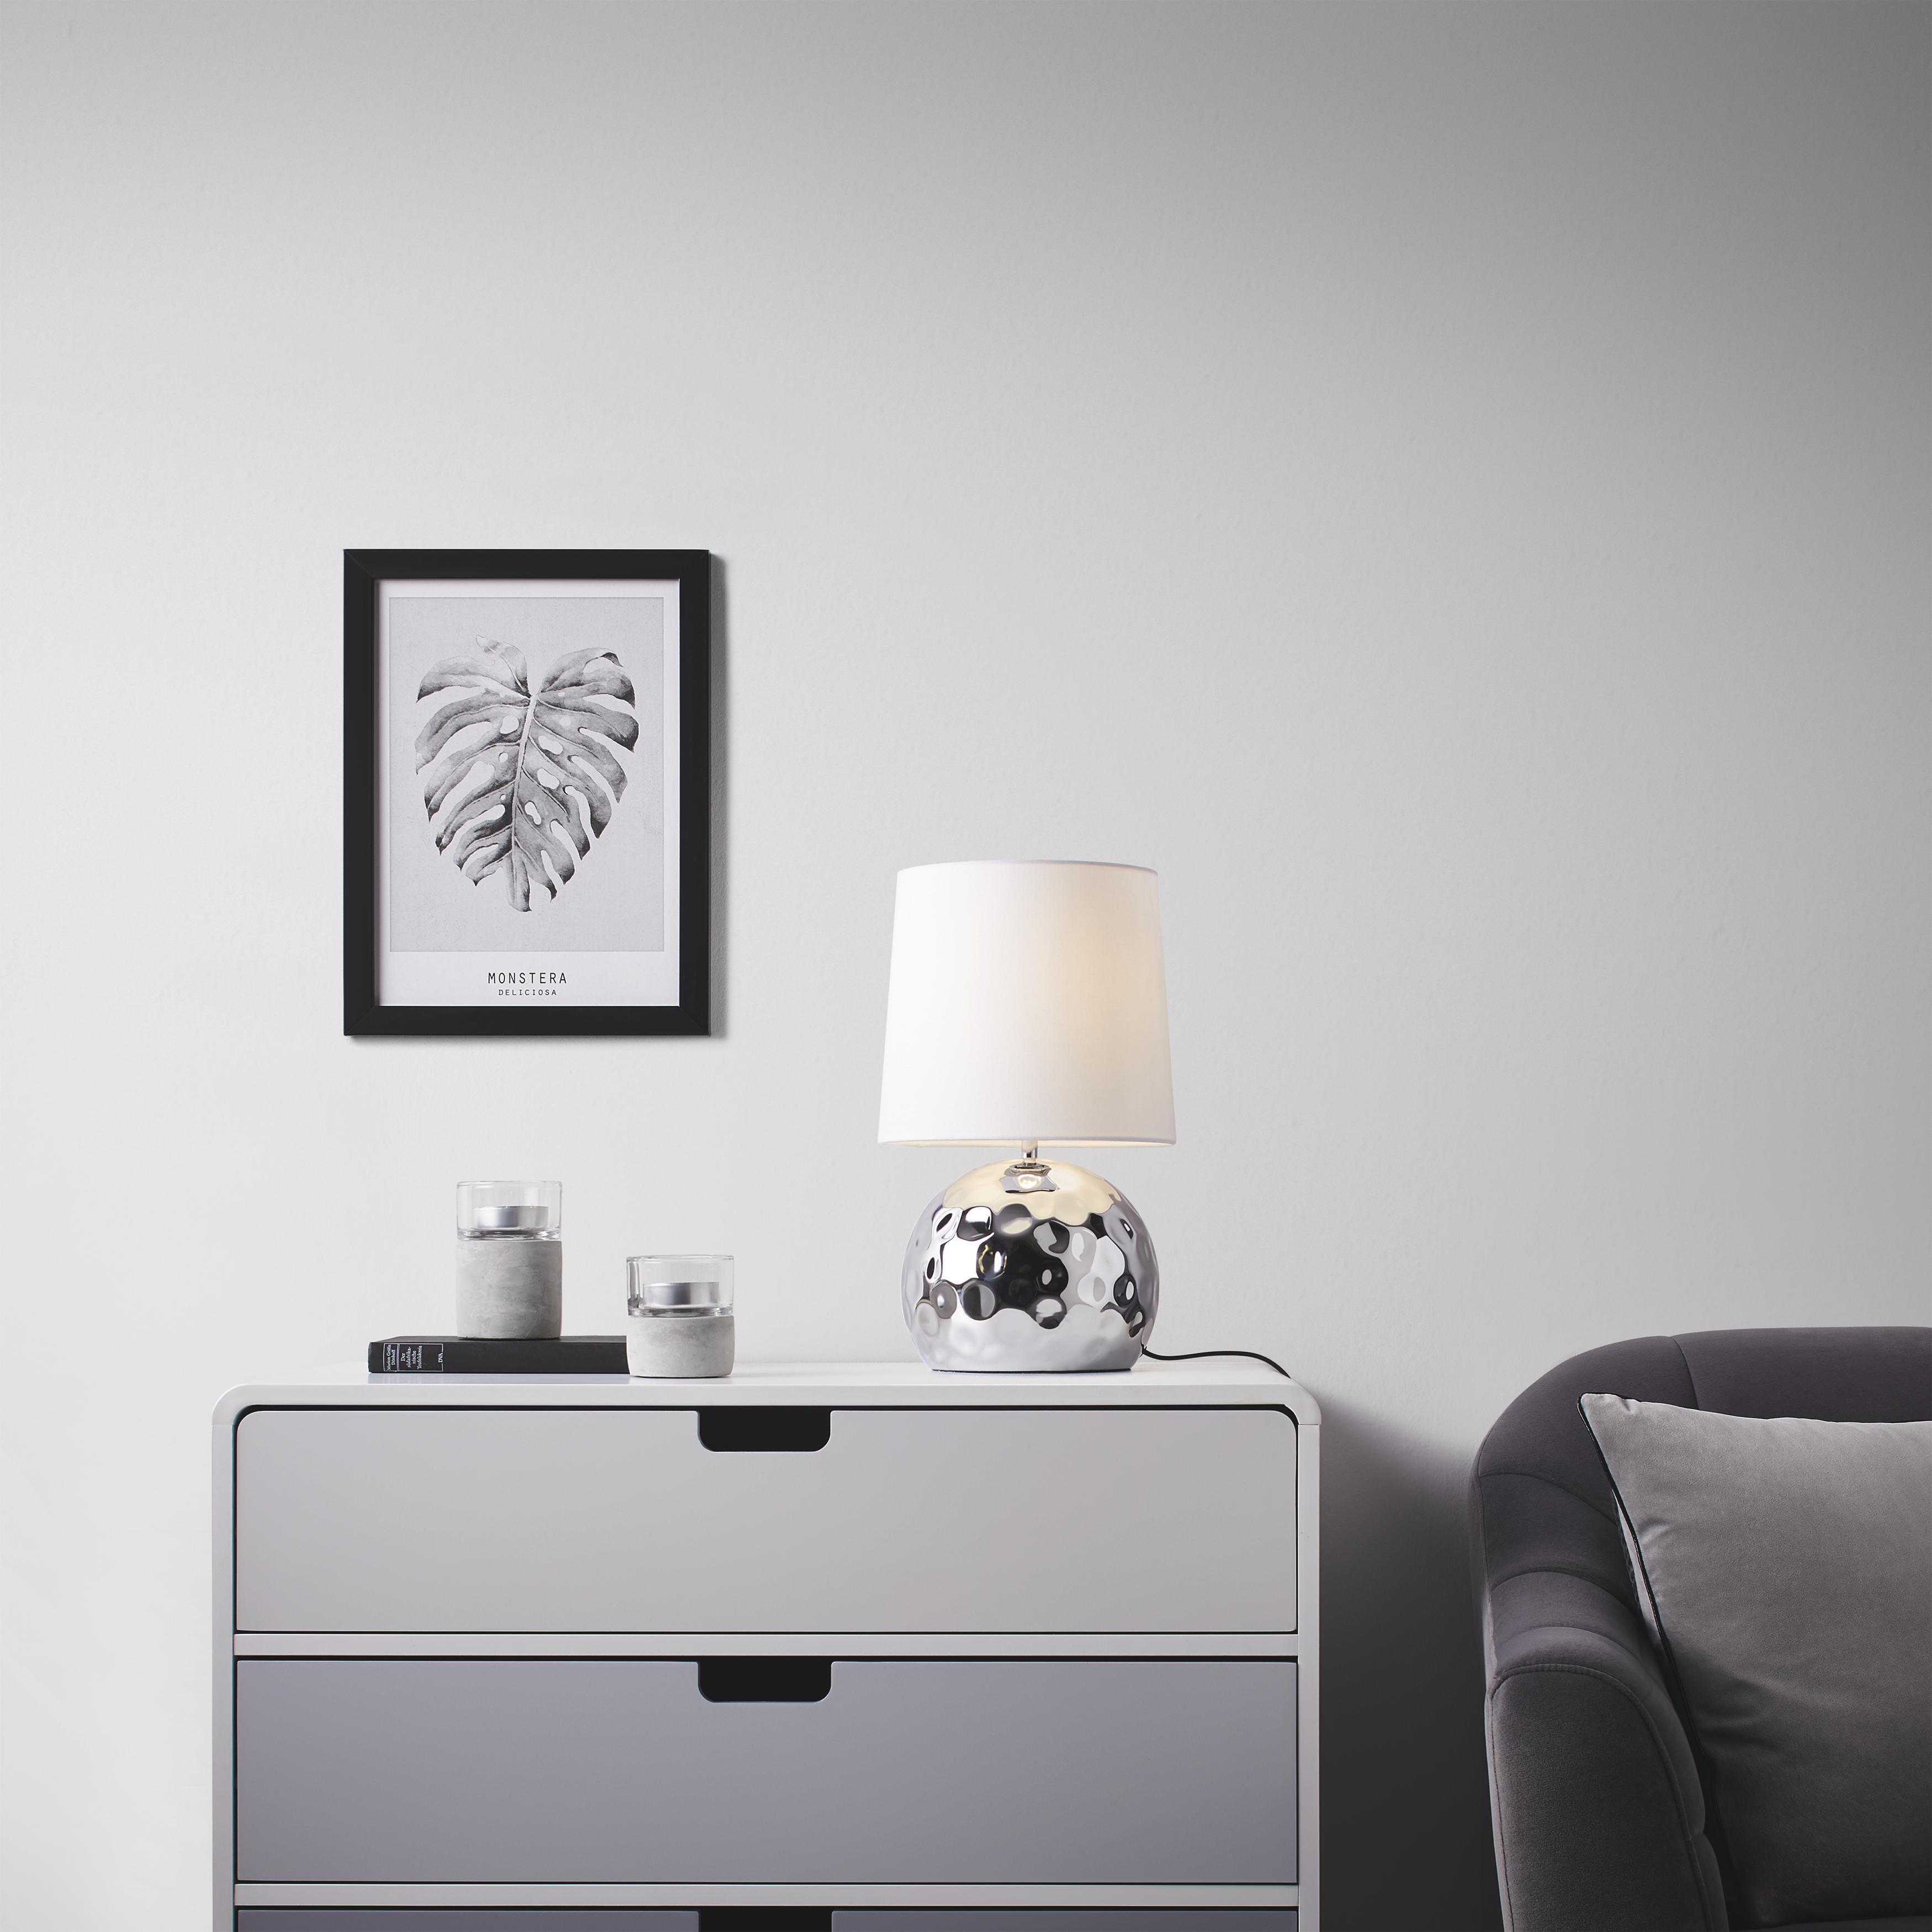 Beleuchtung 57cm Tischlampe Fur Kommode Lampe Sideboard Tischlampe